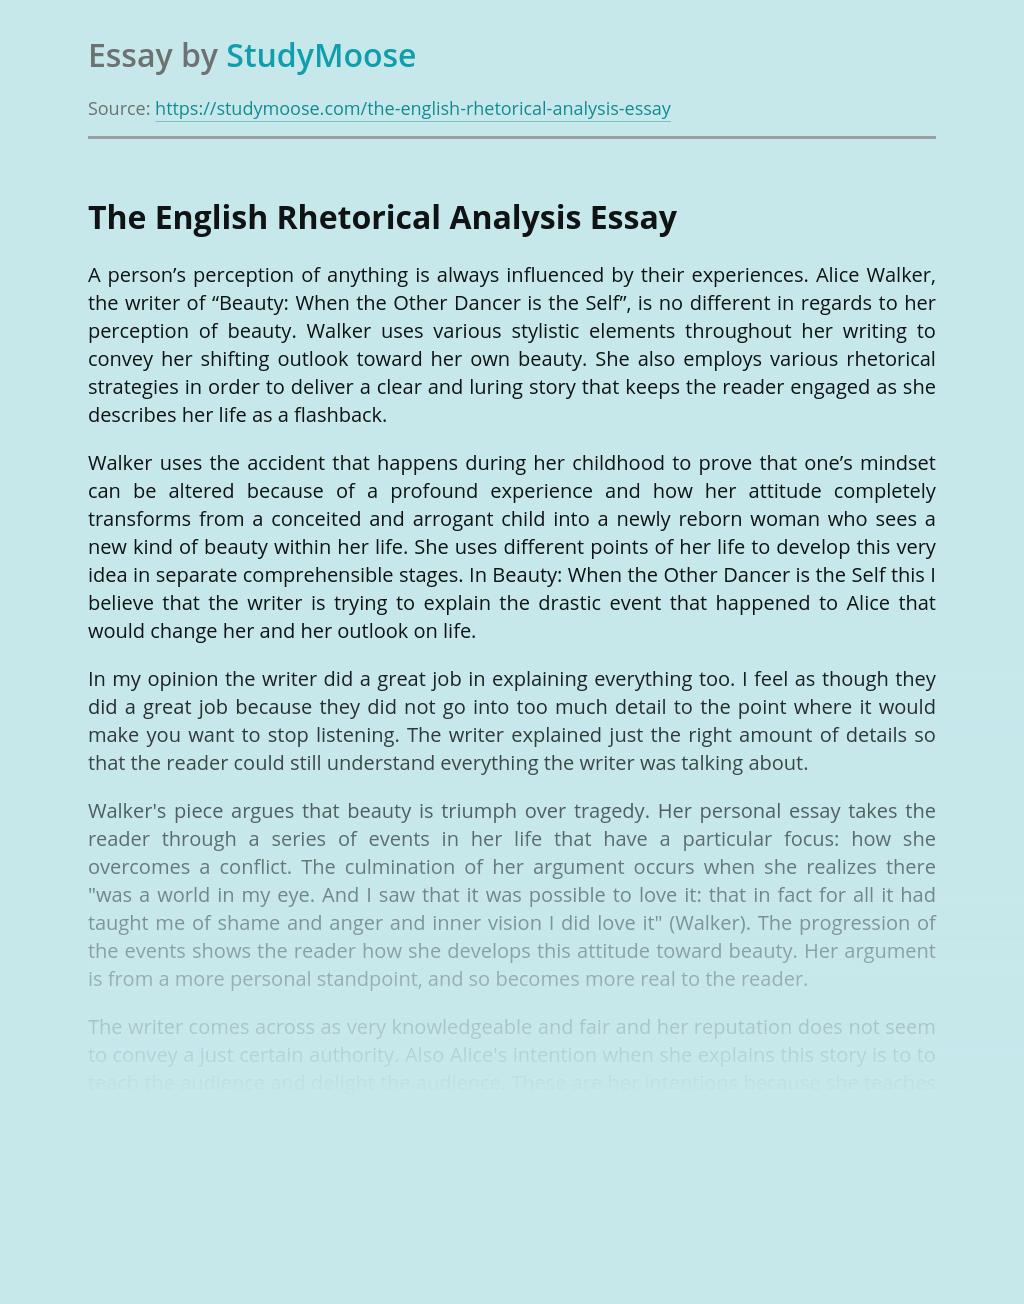 The English Rhetorical Analysis